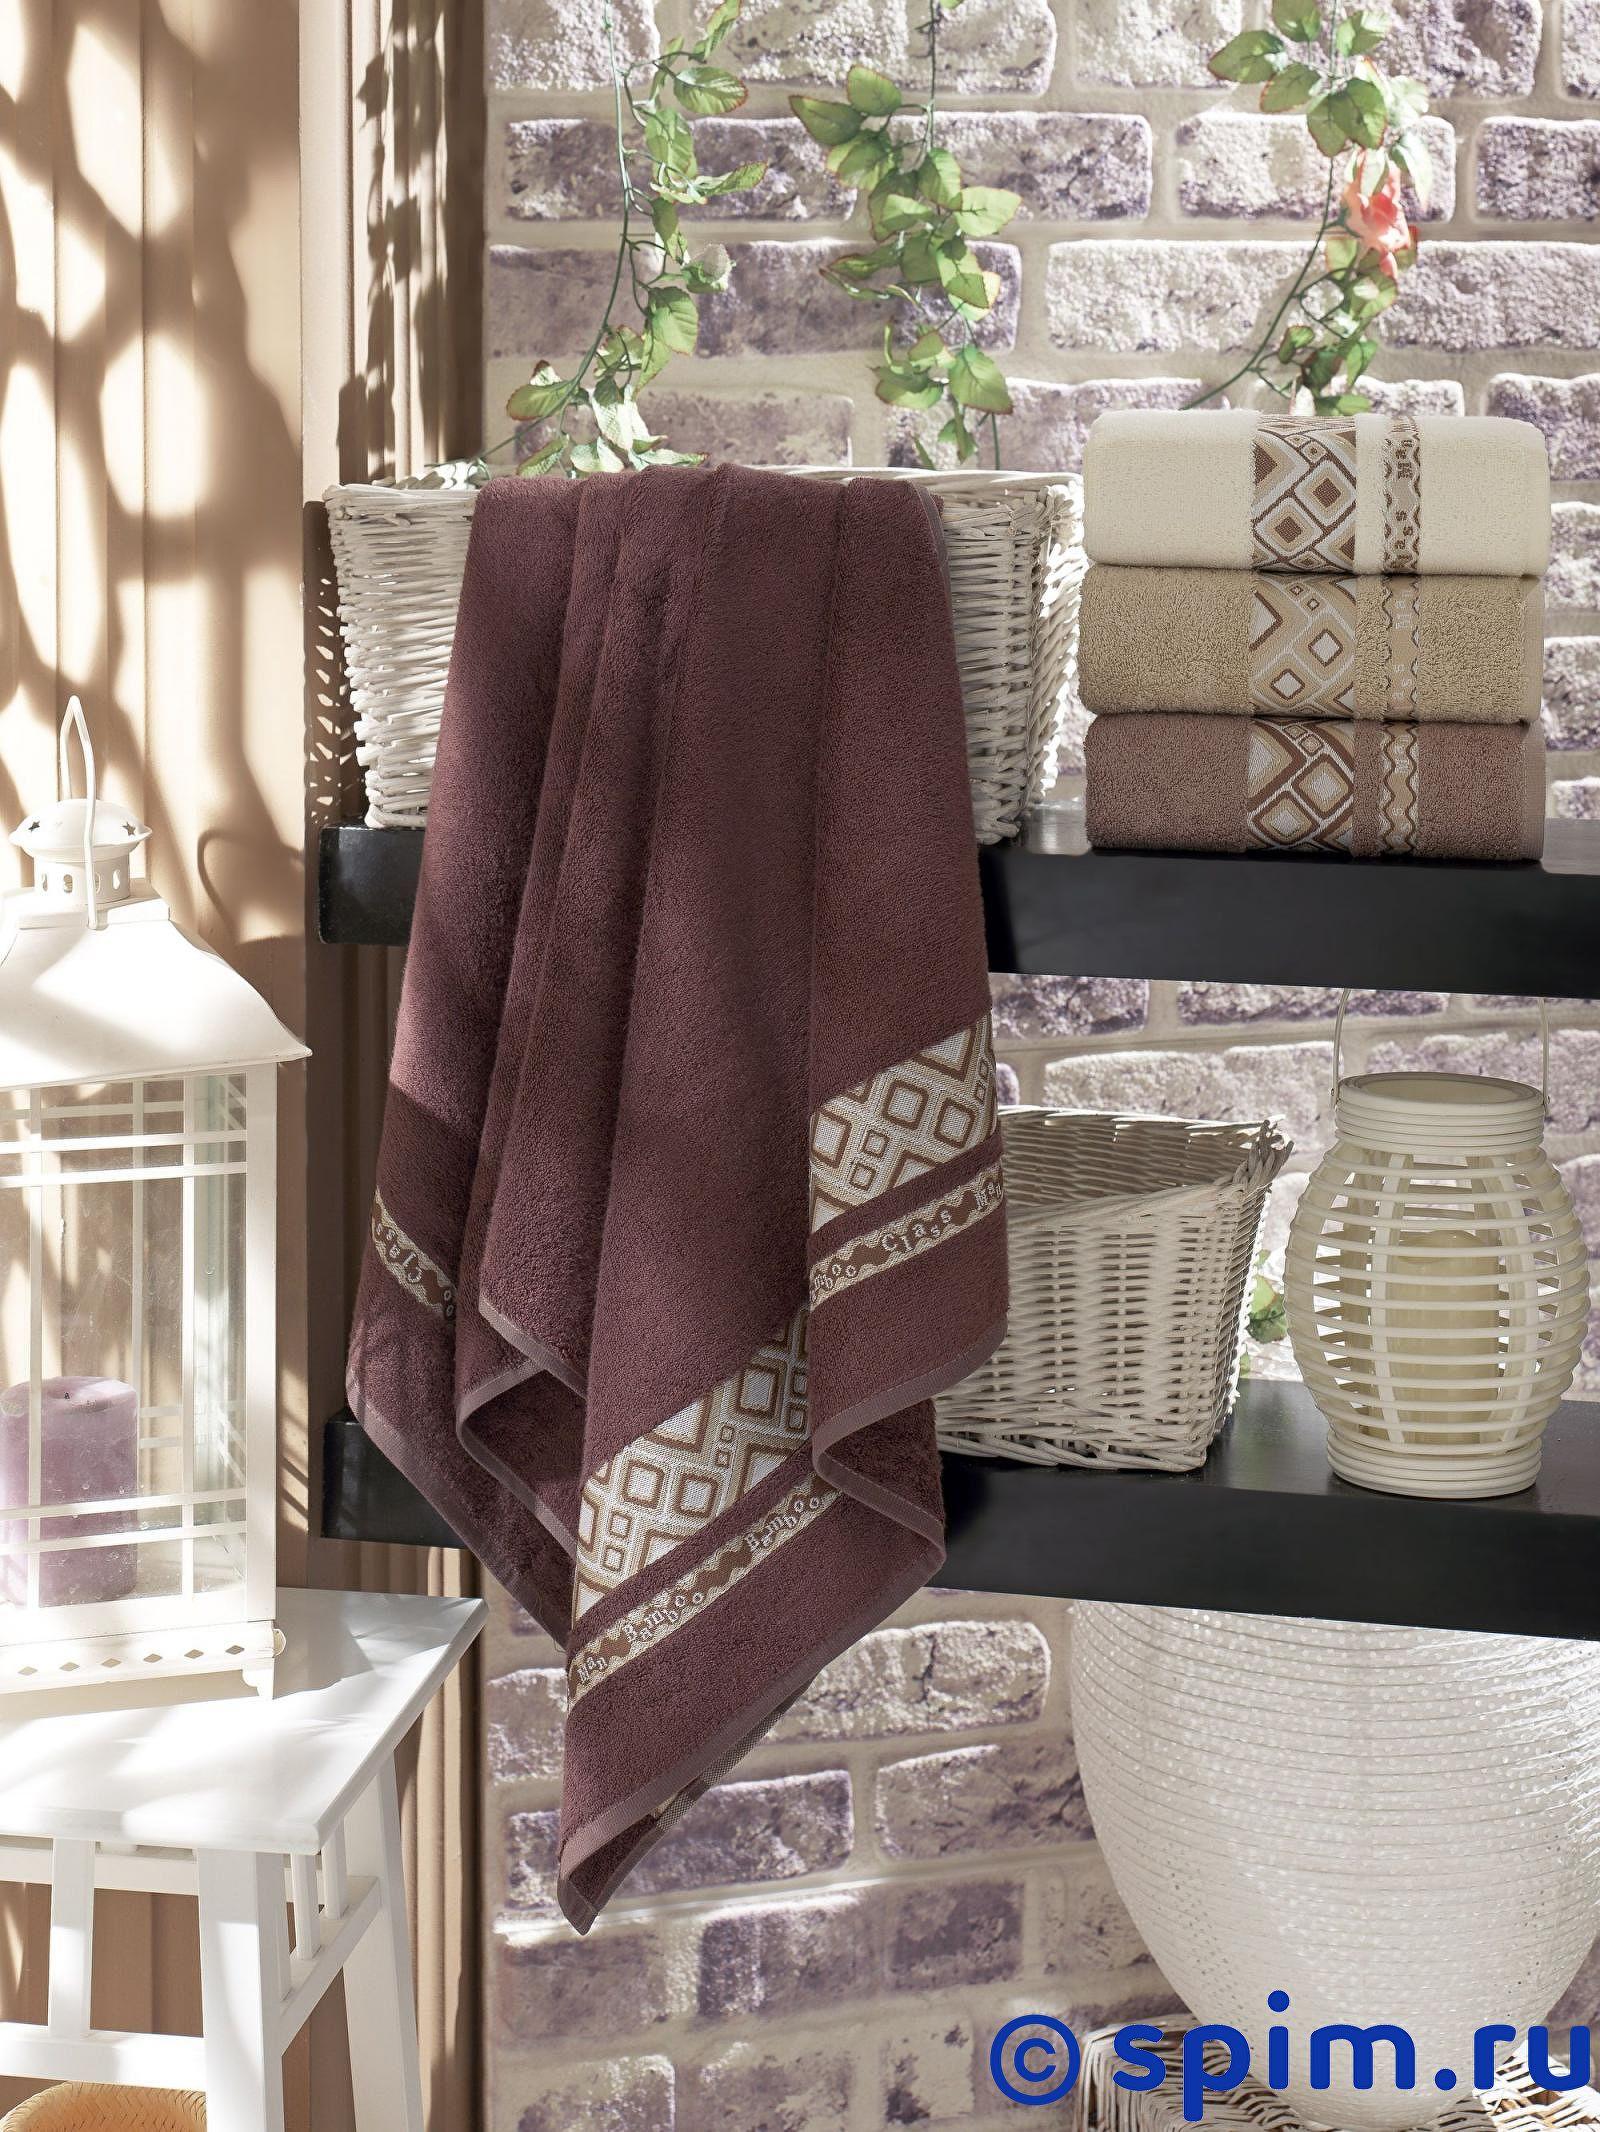 Набор из 4-х полотенец Do&co Camellia 50х90 см полотенца do n co полотенце lady цвет мятный набор